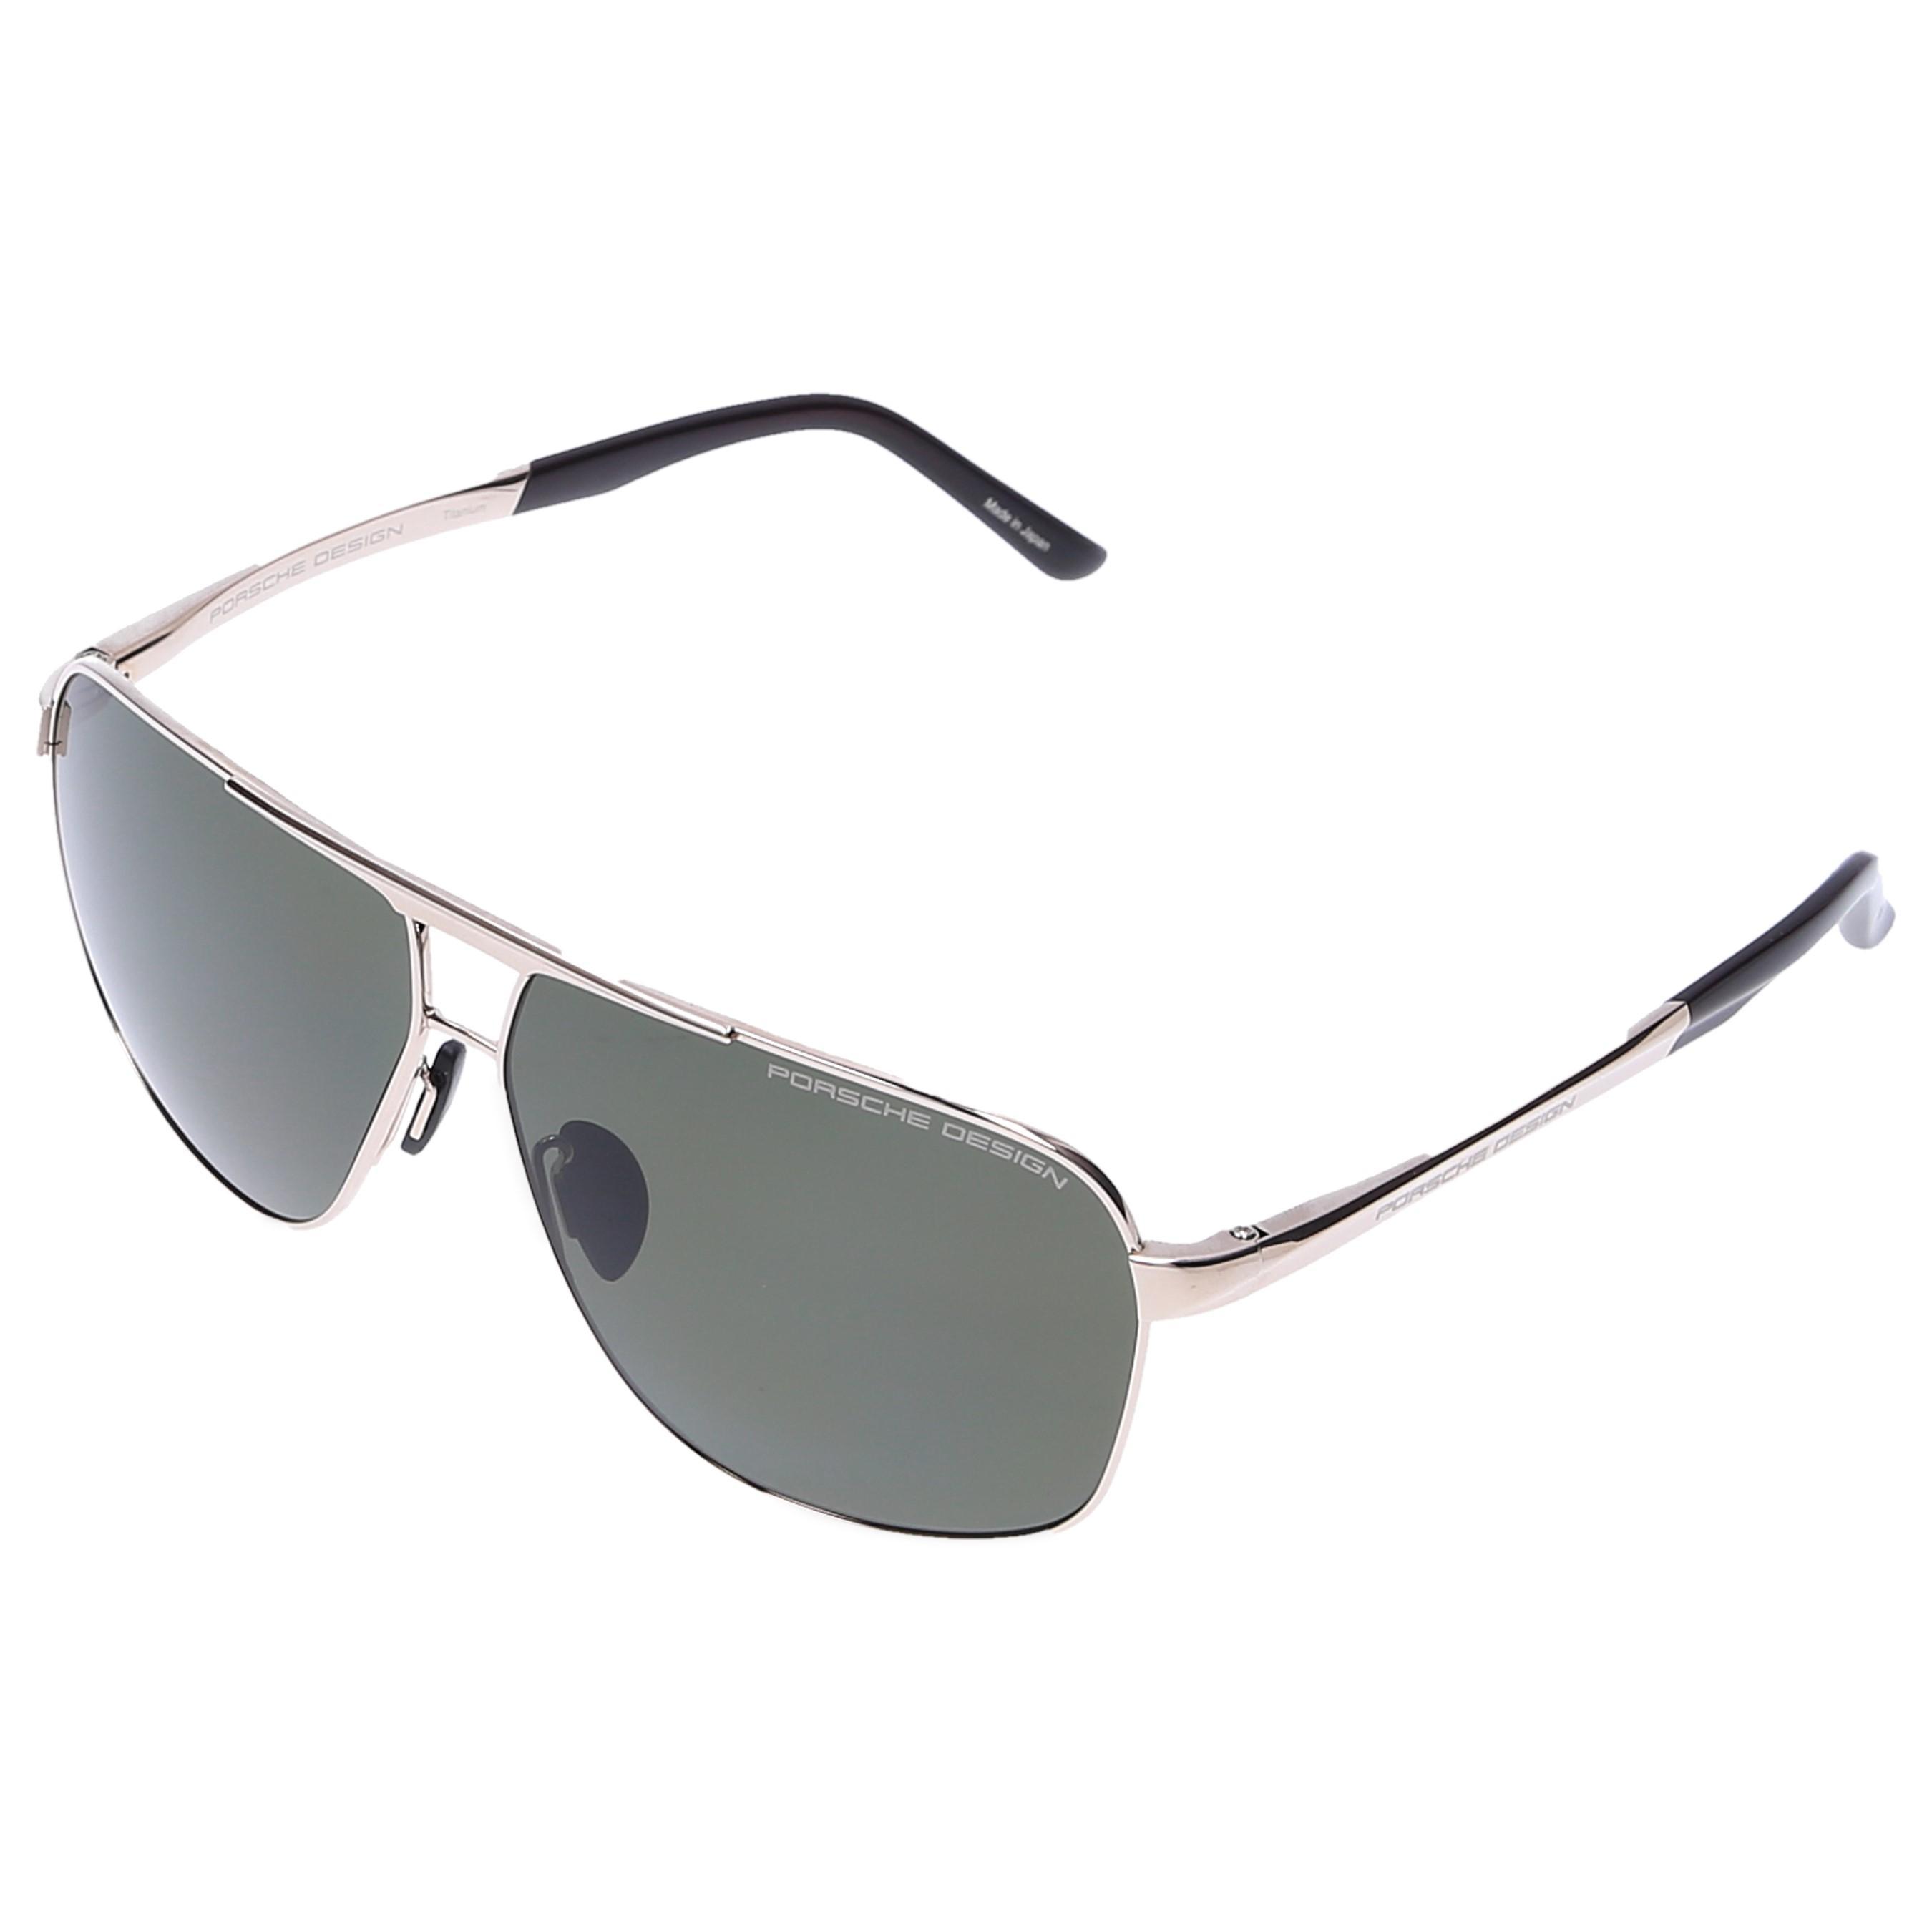 b118232ebdc Porsche Design - Metallic Men Sunglasses Aviator 8665 Titanium Gold Black  for Men - Lyst. View fullscreen